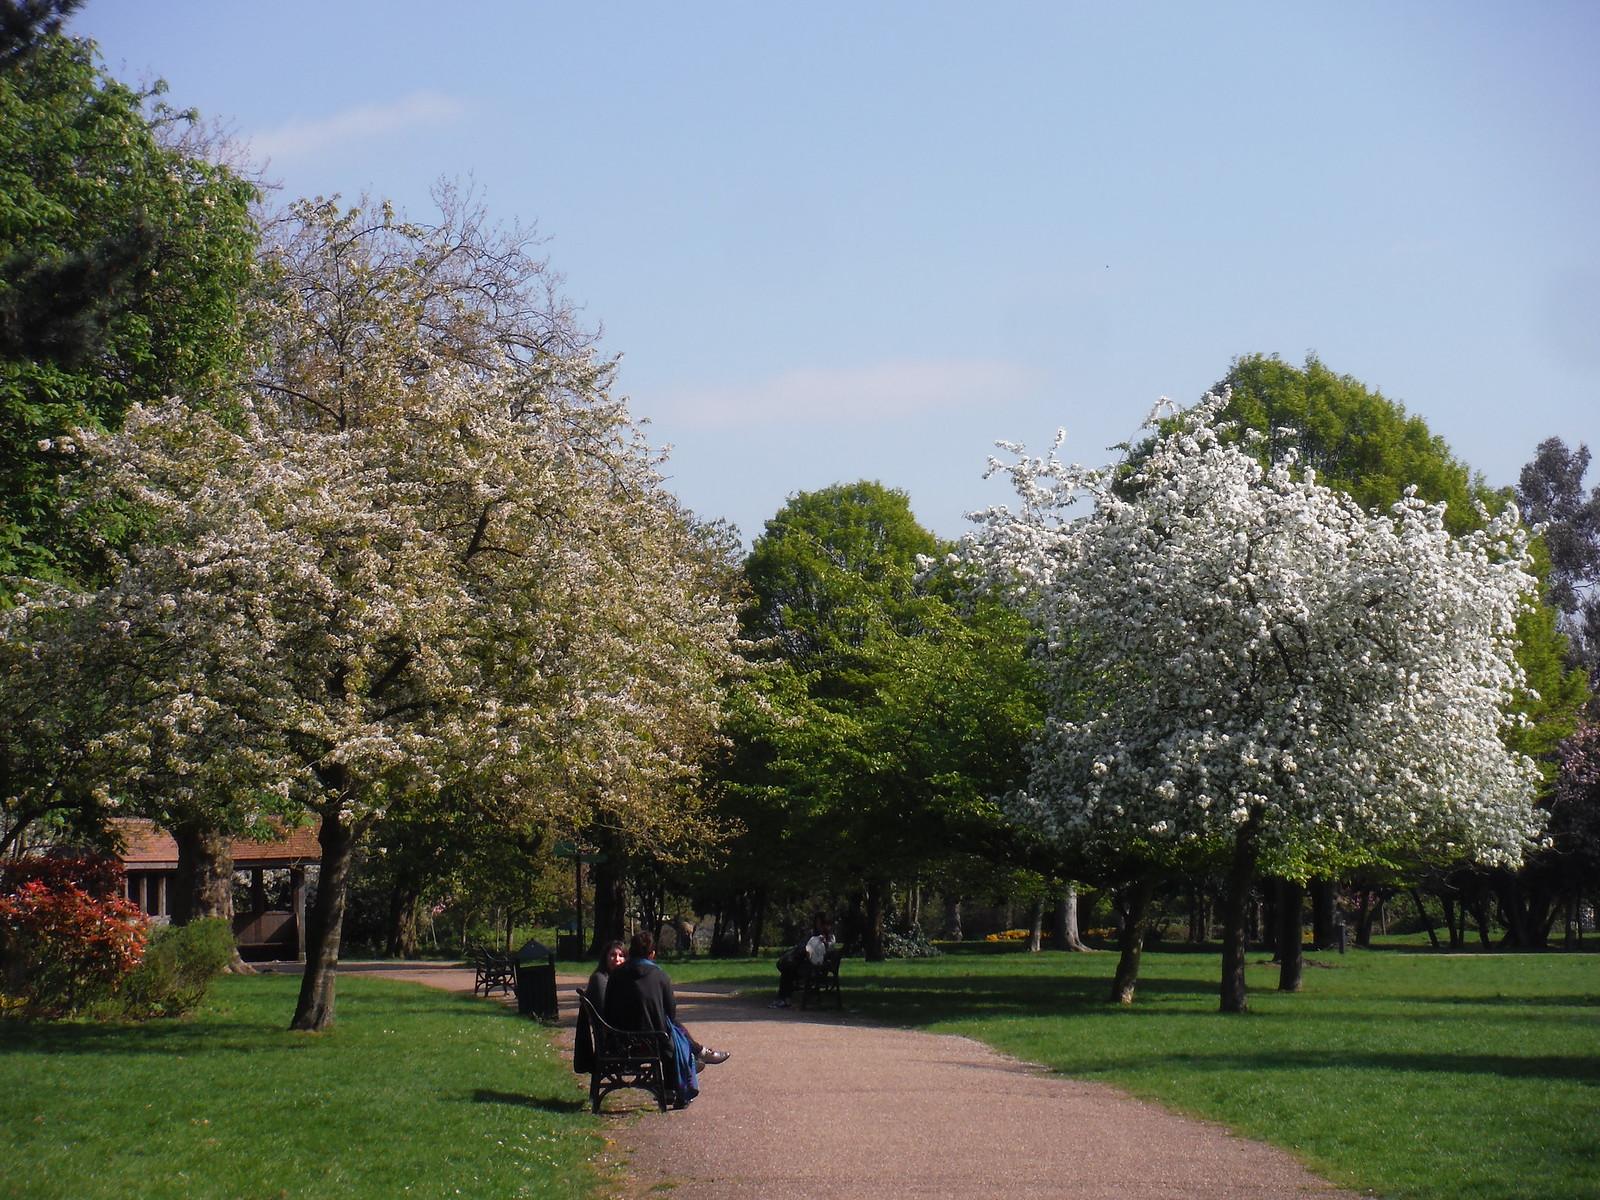 Path in Finsbury Park SWC Short Walk 26 - Woodberry Wetlands (Stoke Newington Reservoirs)